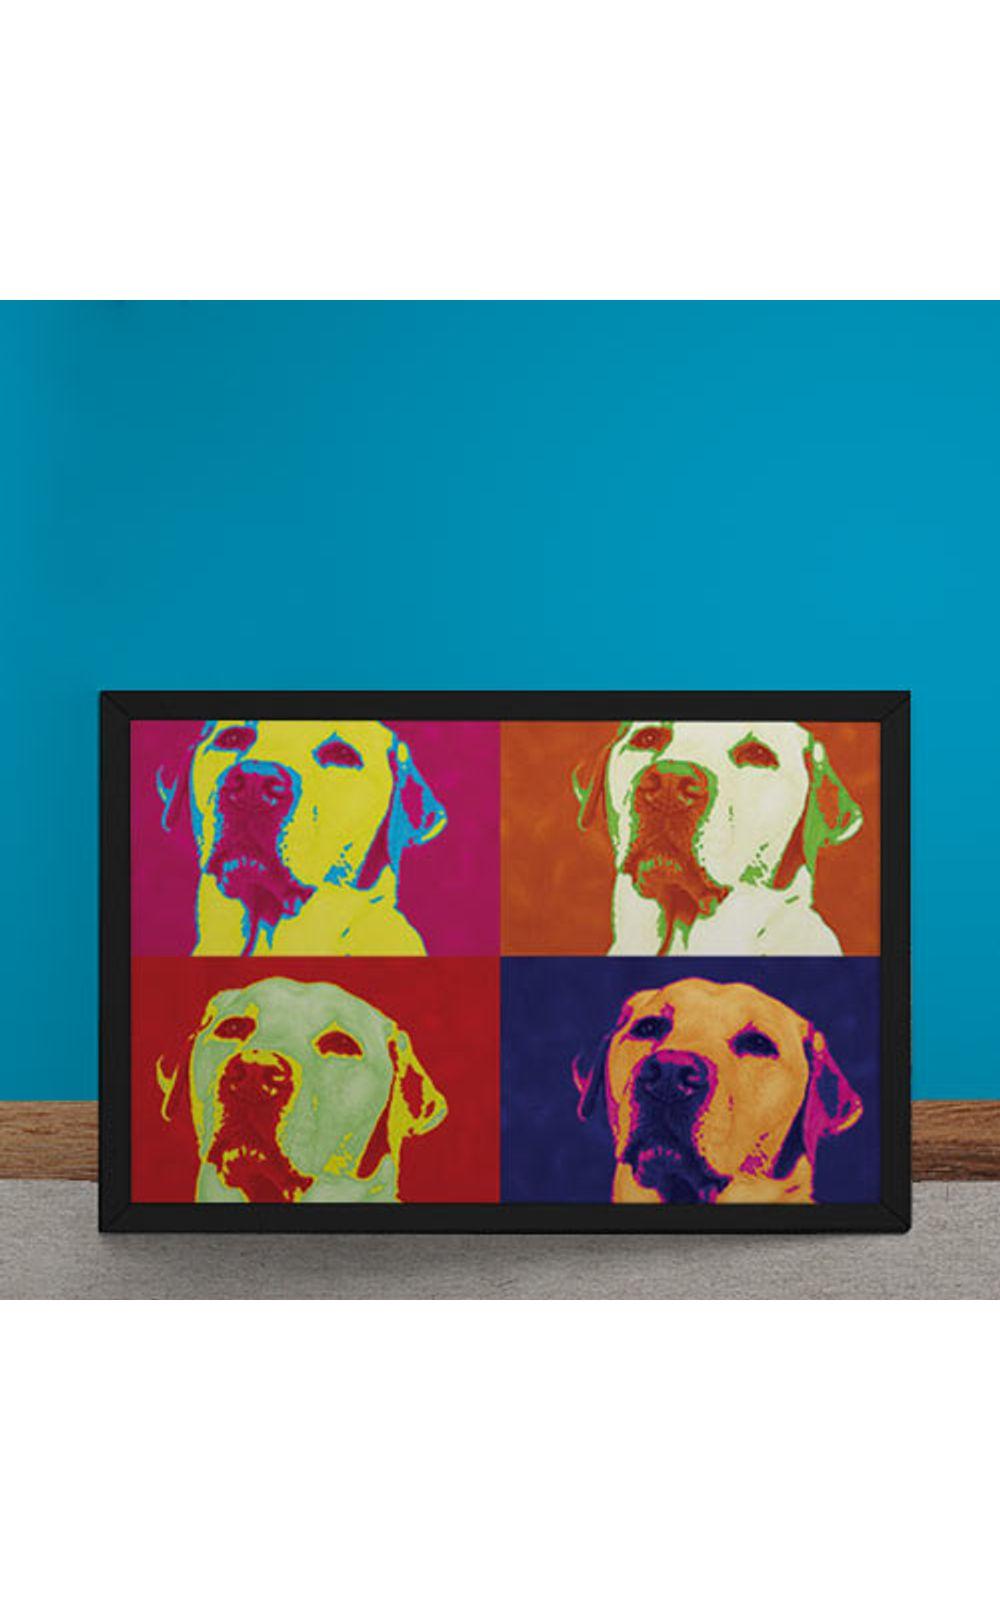 Foto 6 - Quadro Decorativo Andy Warhol Pop Art Cachorro Labrador